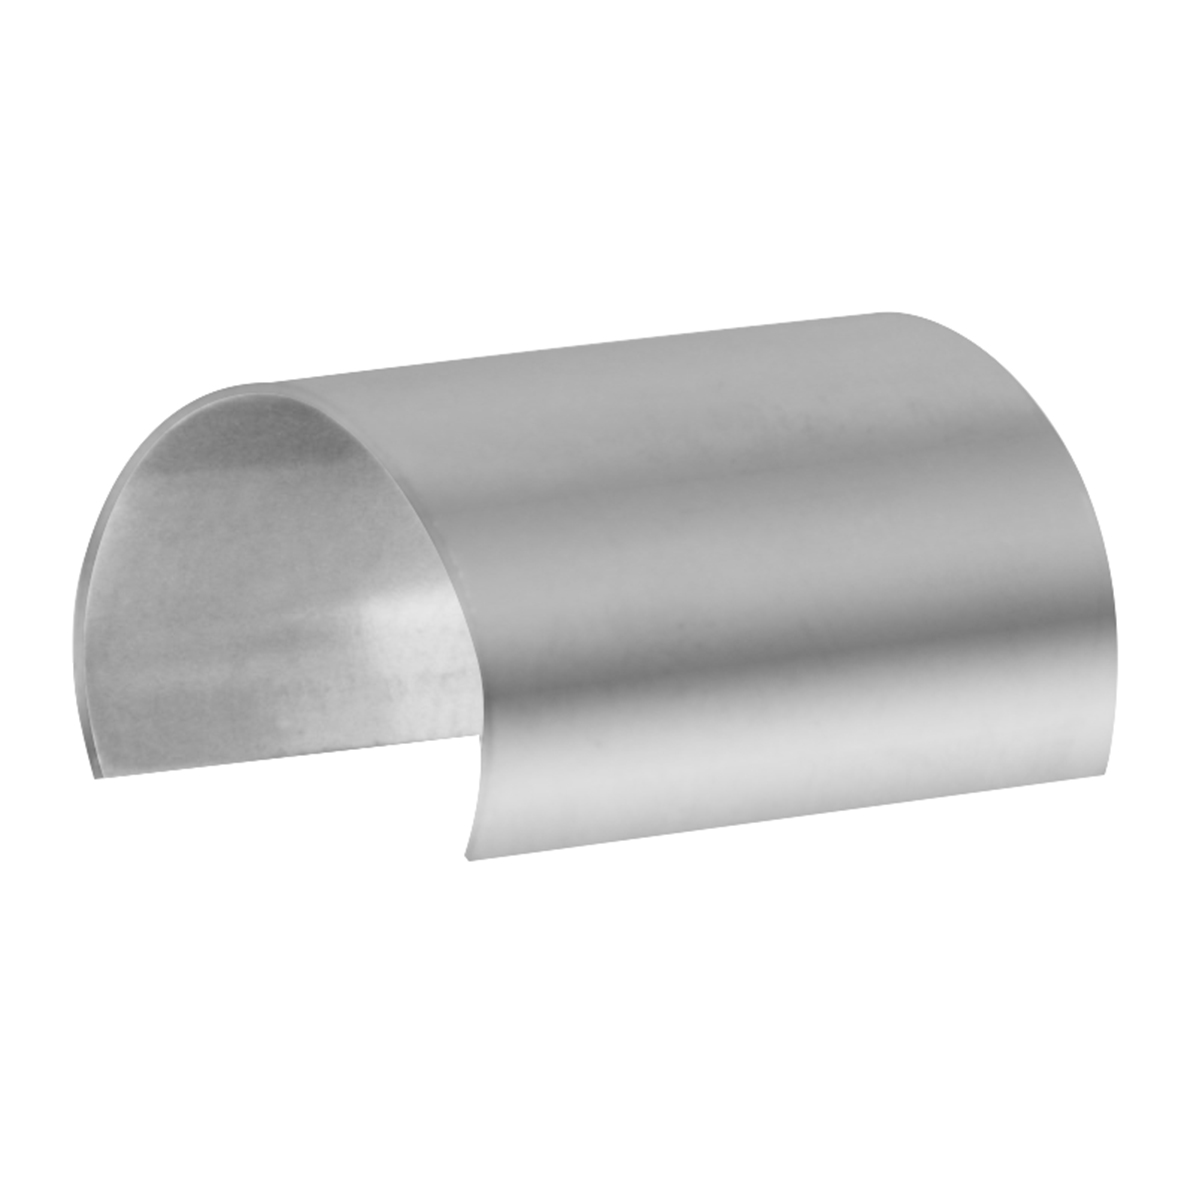 50172 Stainless Steel Door Hinge Cover